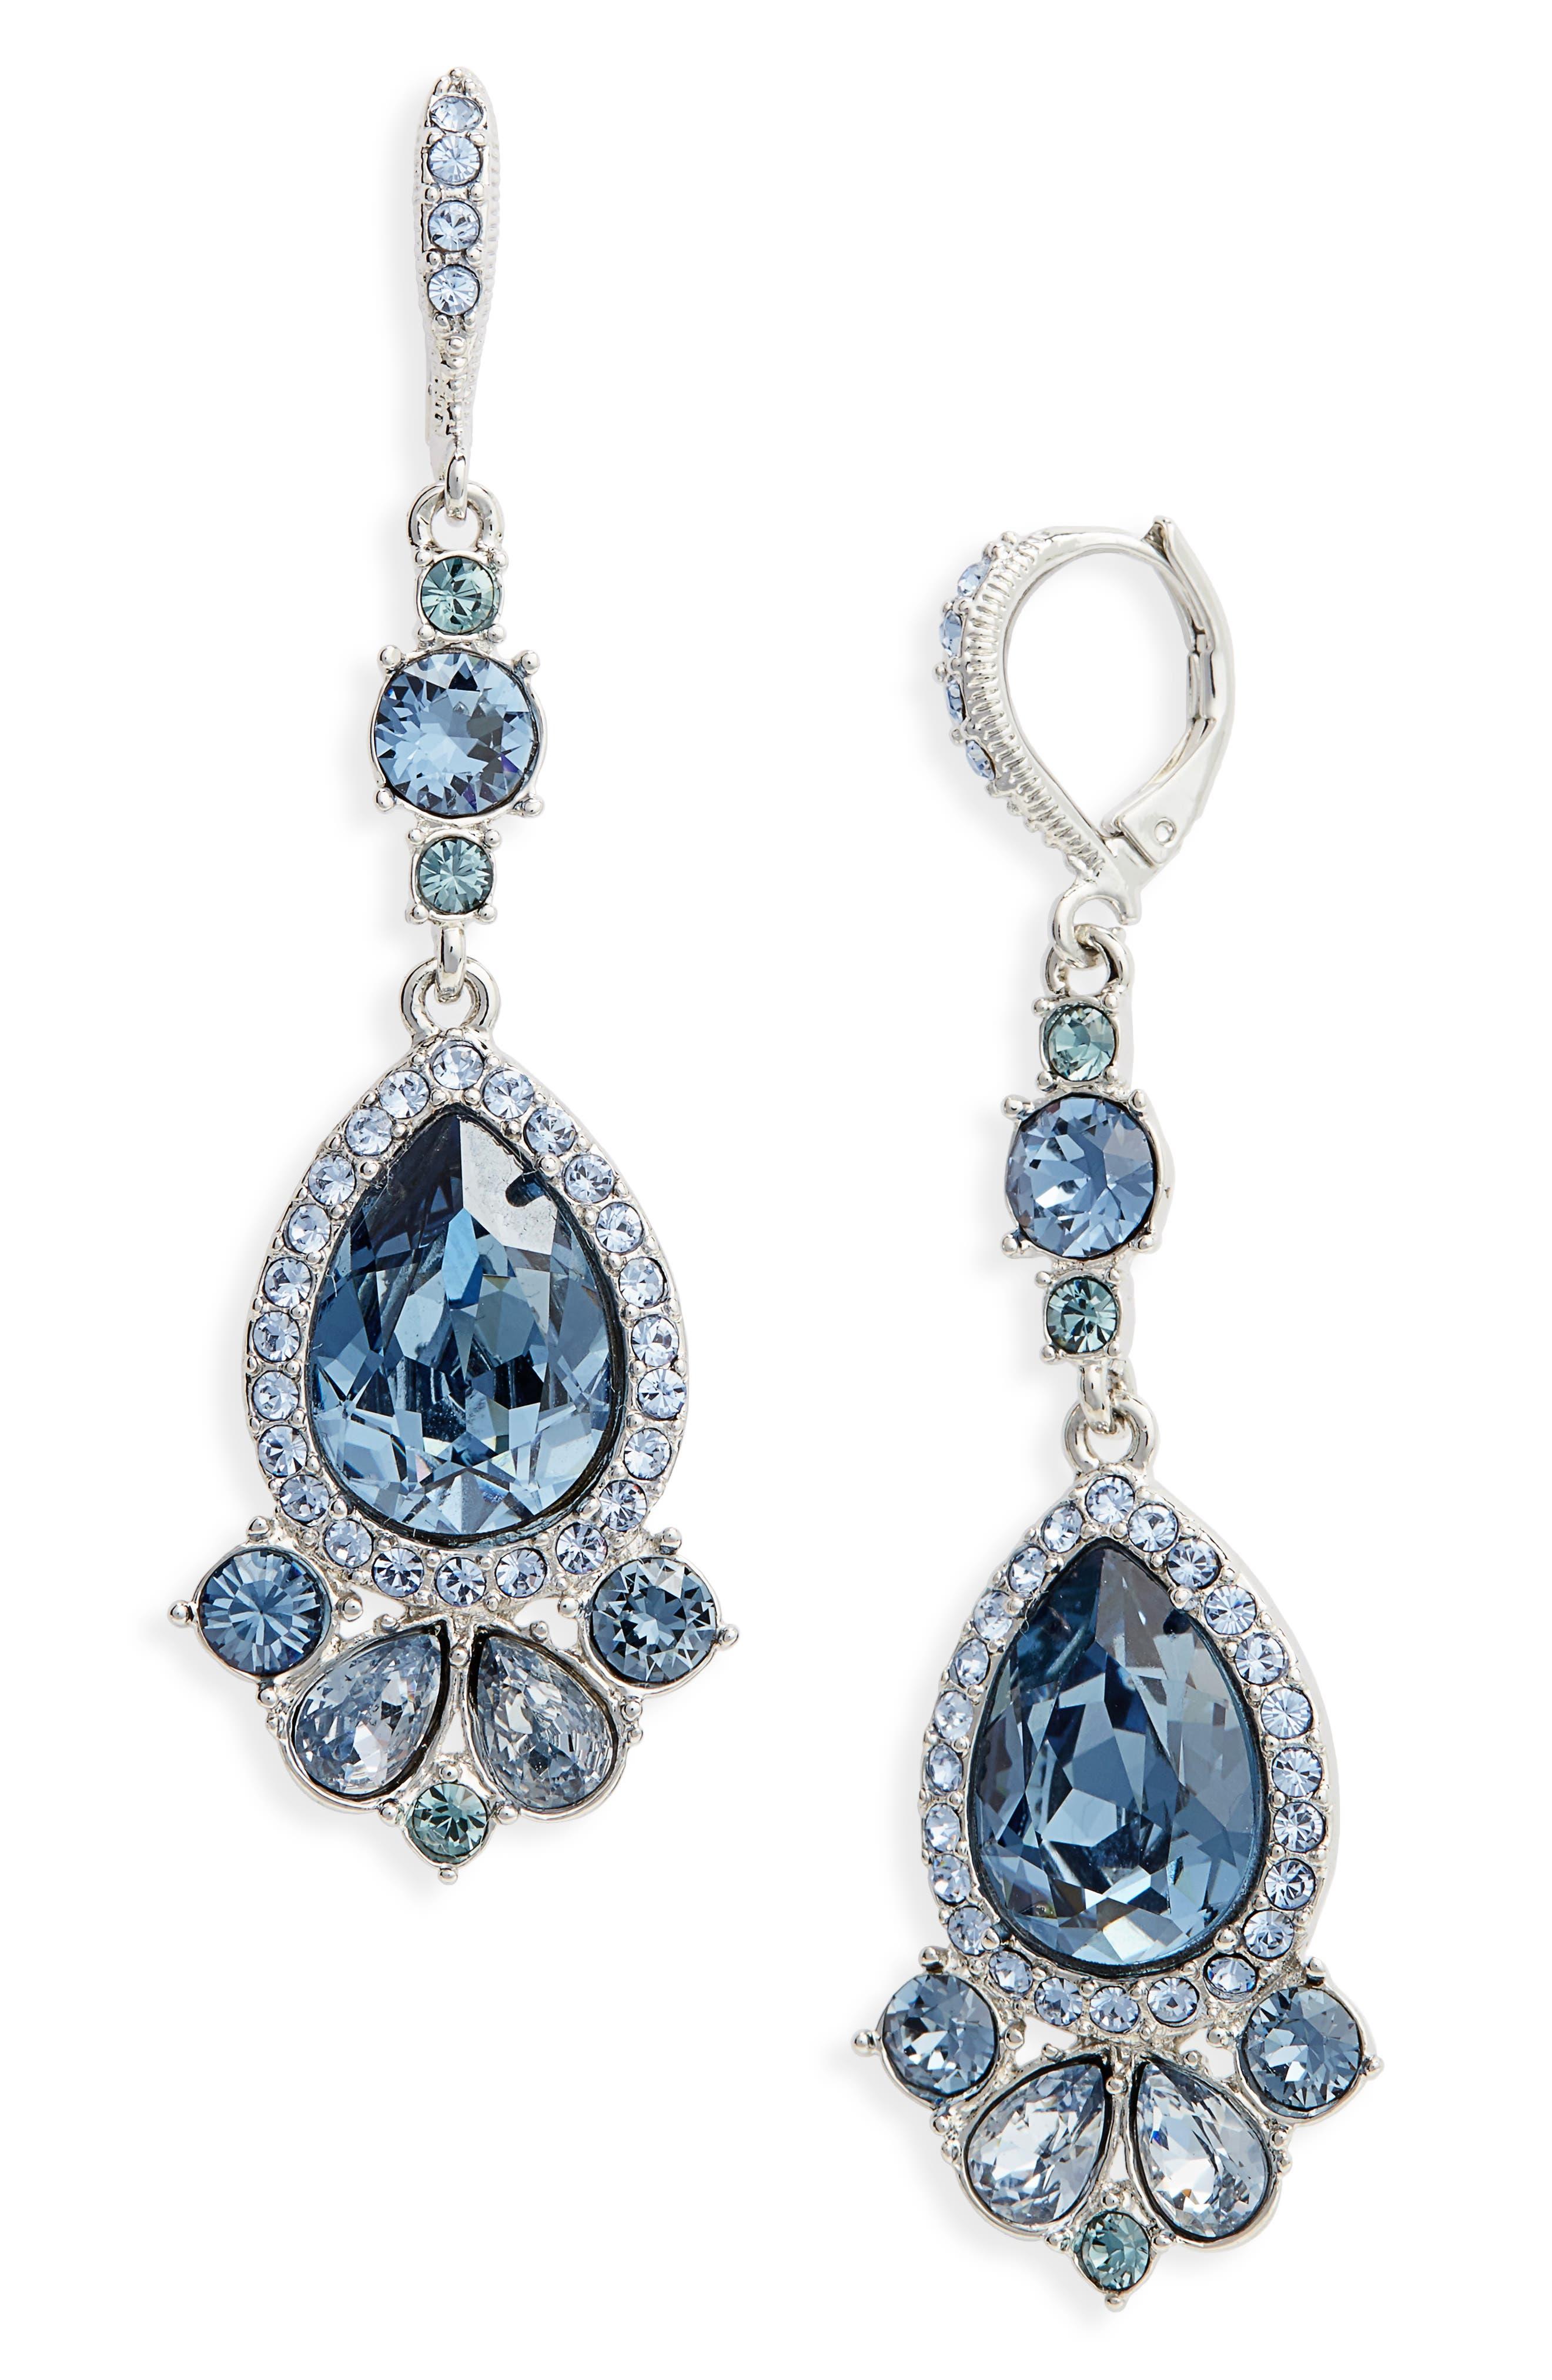 Givenchy Verona Large Pear Drop Earrings